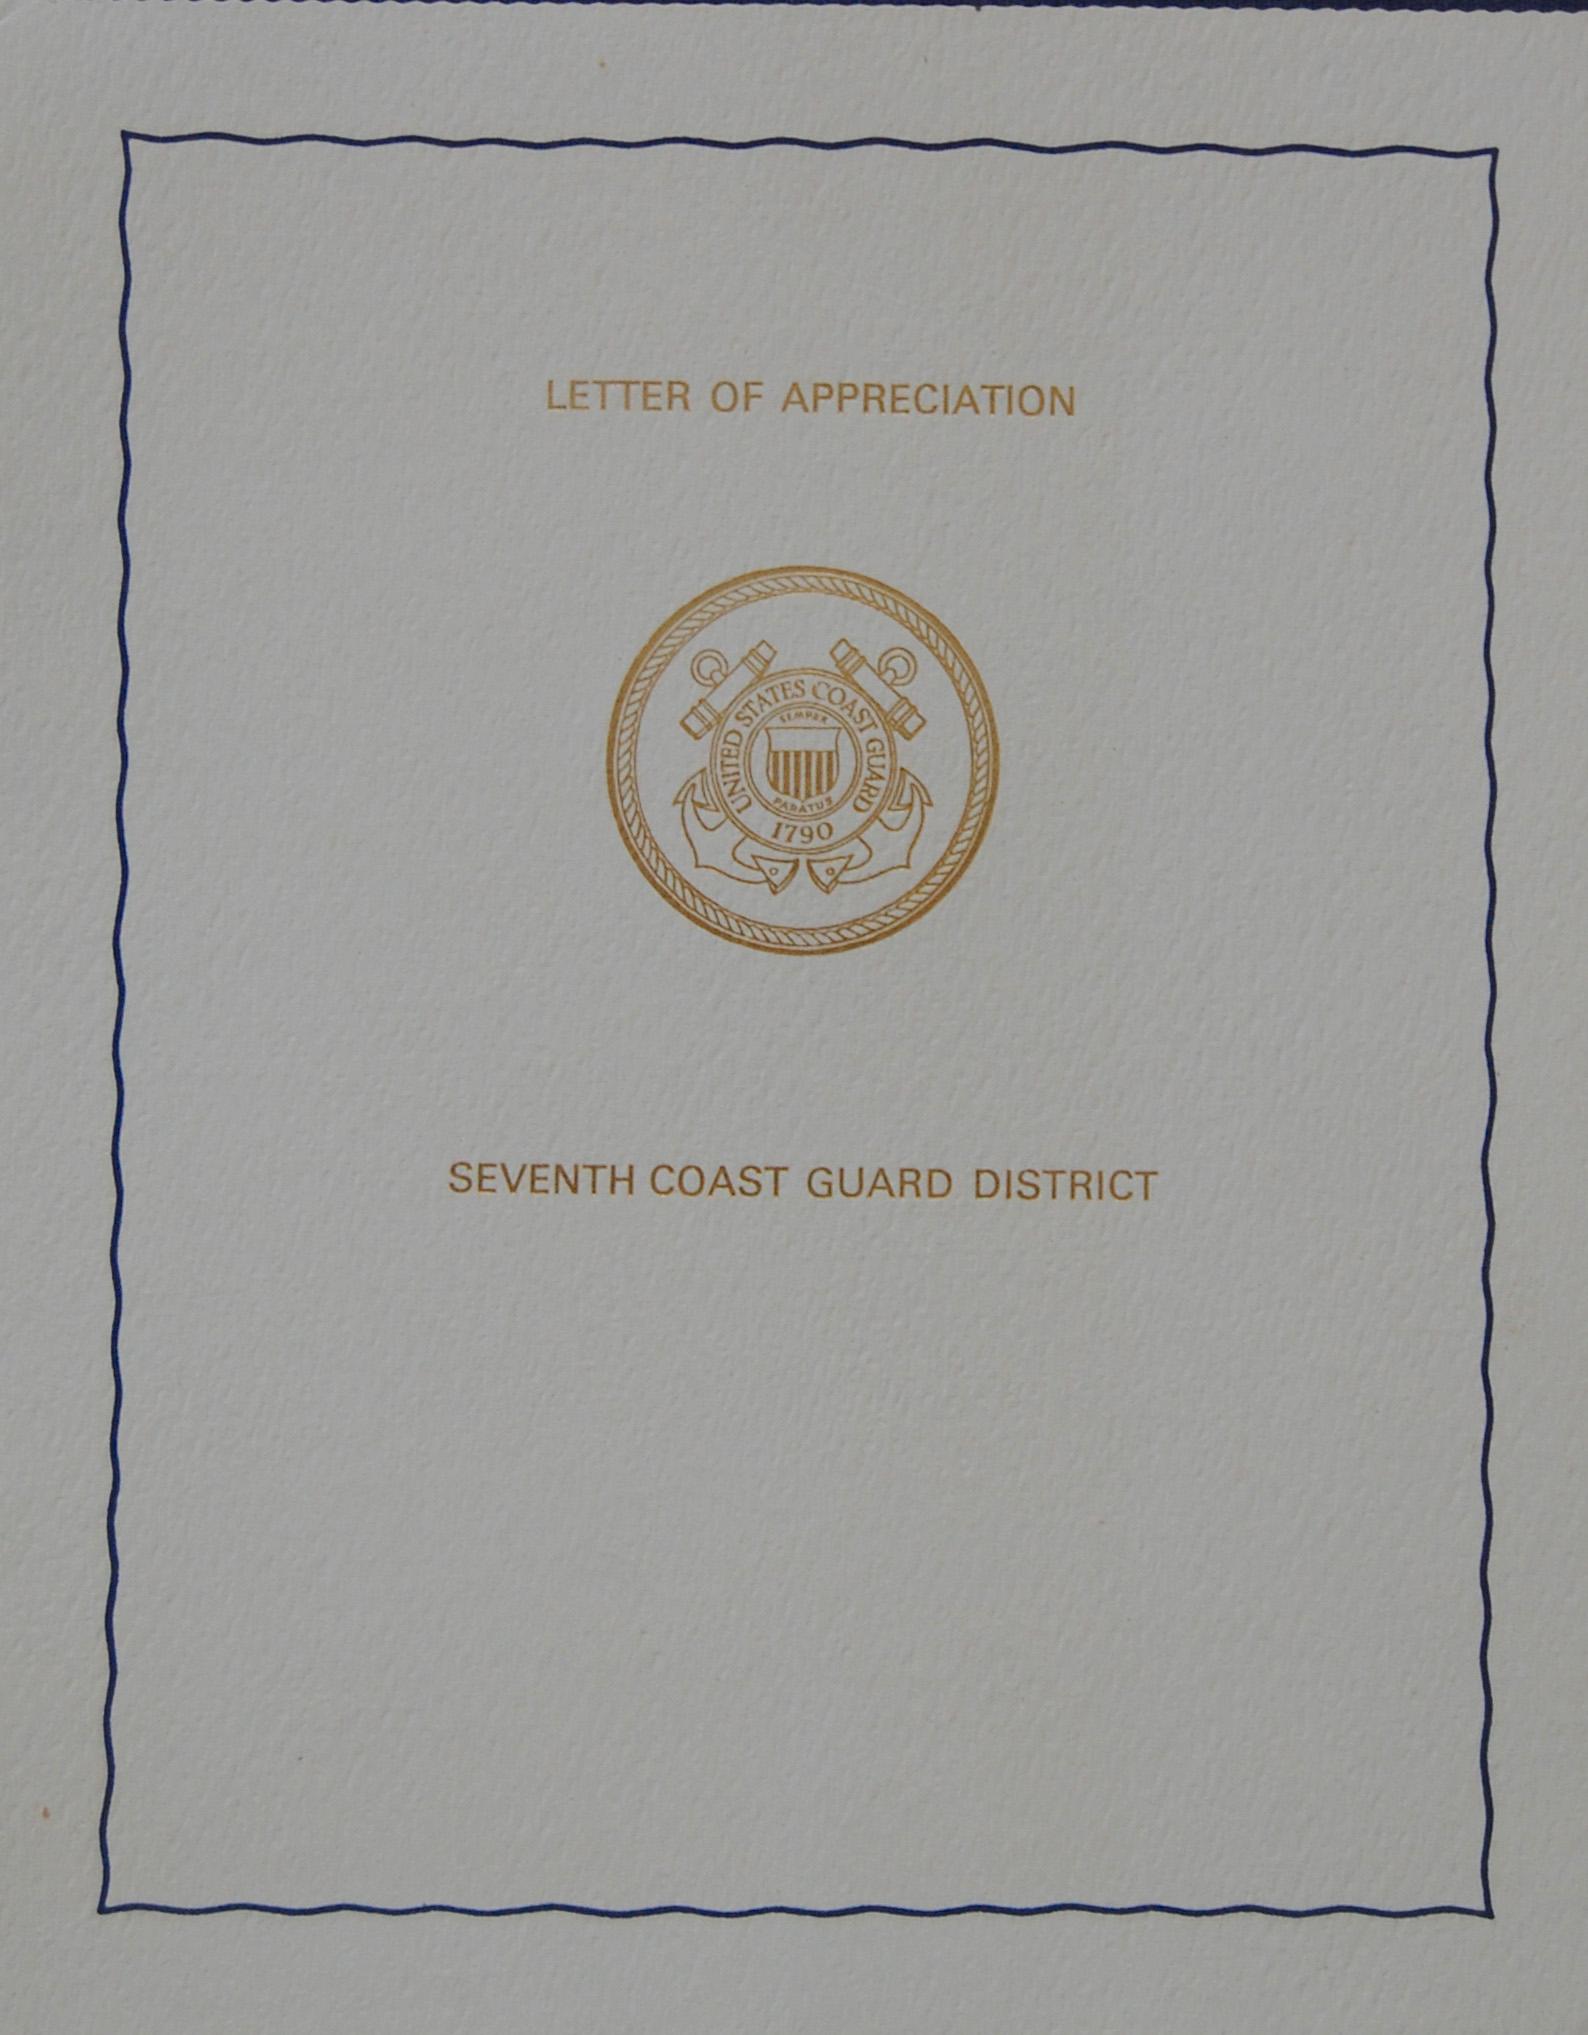 USCG Letter of Appreciation Pg 1 Cover 1976.jpg